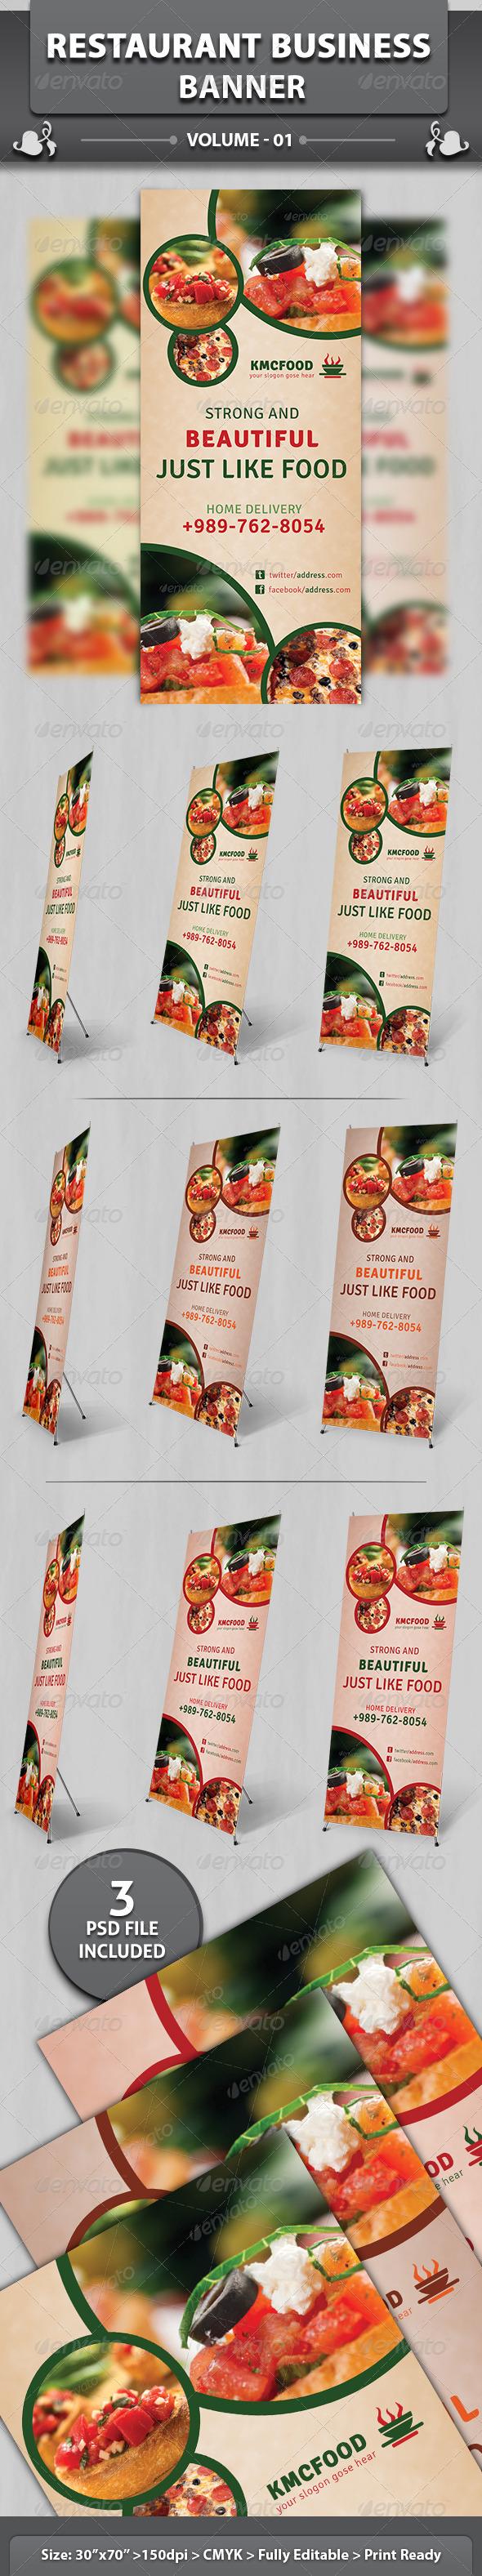 Restaurant Business Banner | Volume 14 - Signage Print Templates